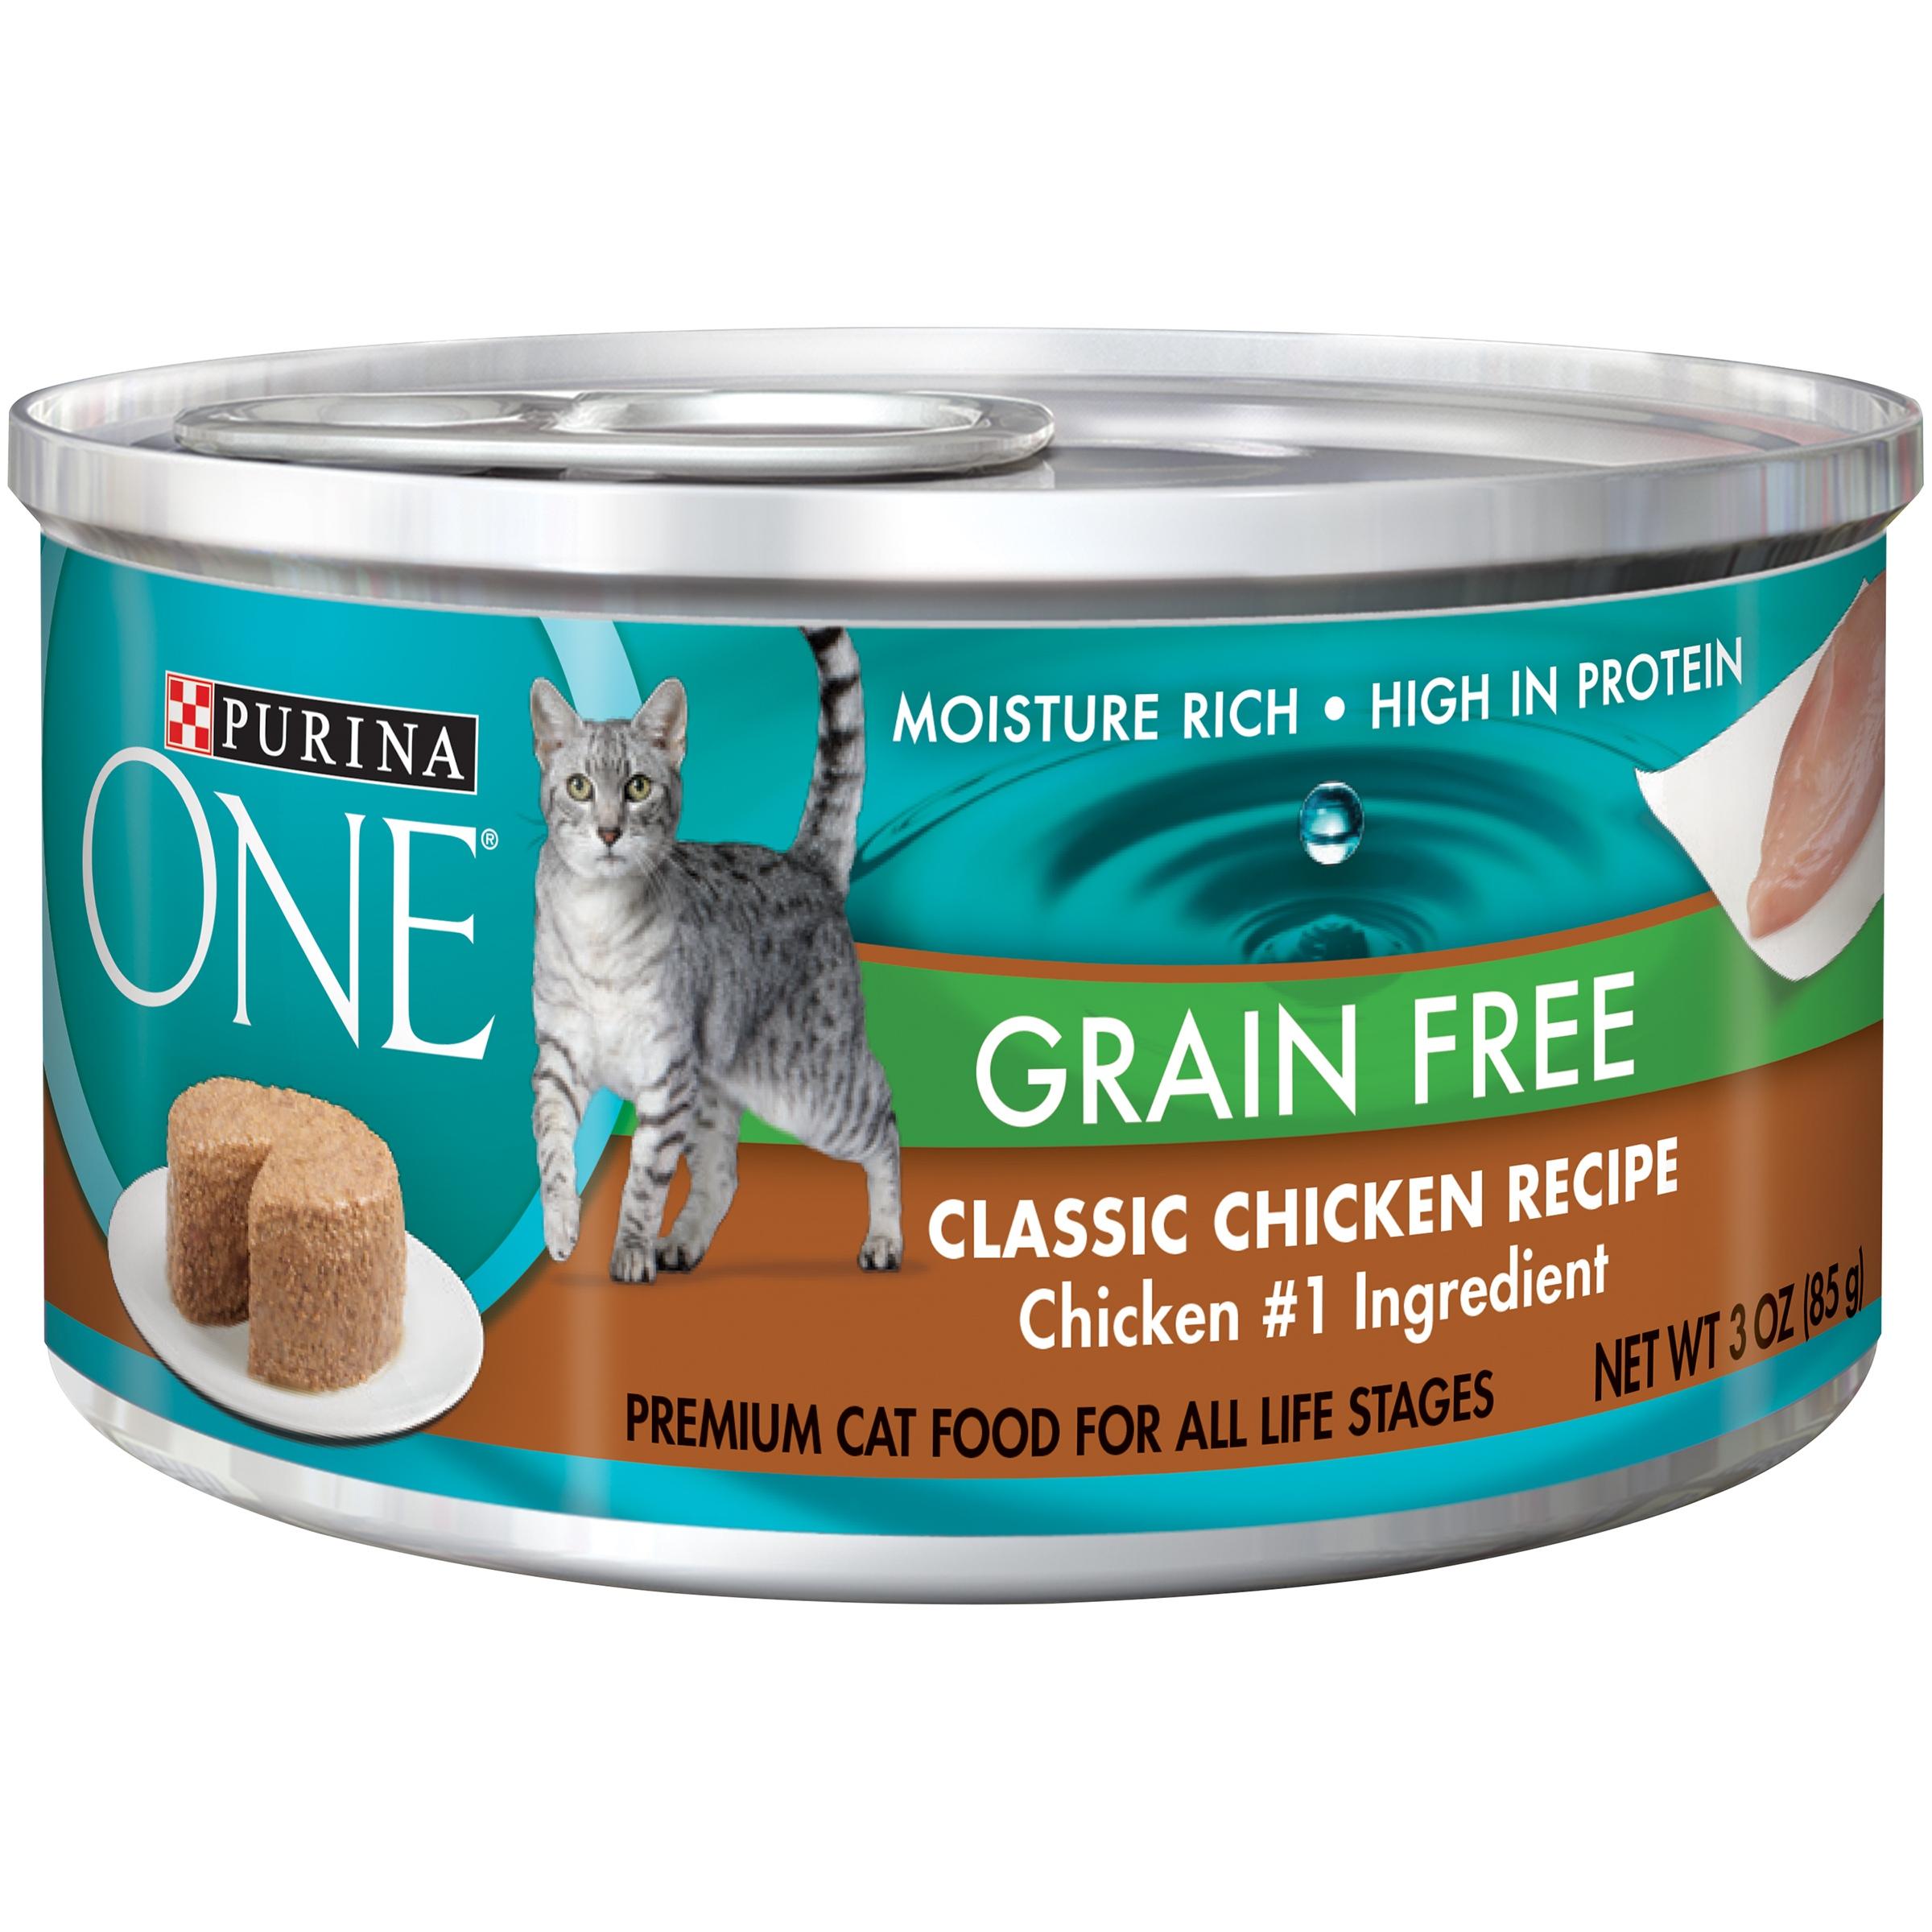 Purina ONE Grain Free Formula Classic Chicken Recipe Premium Pate Cat Food 3